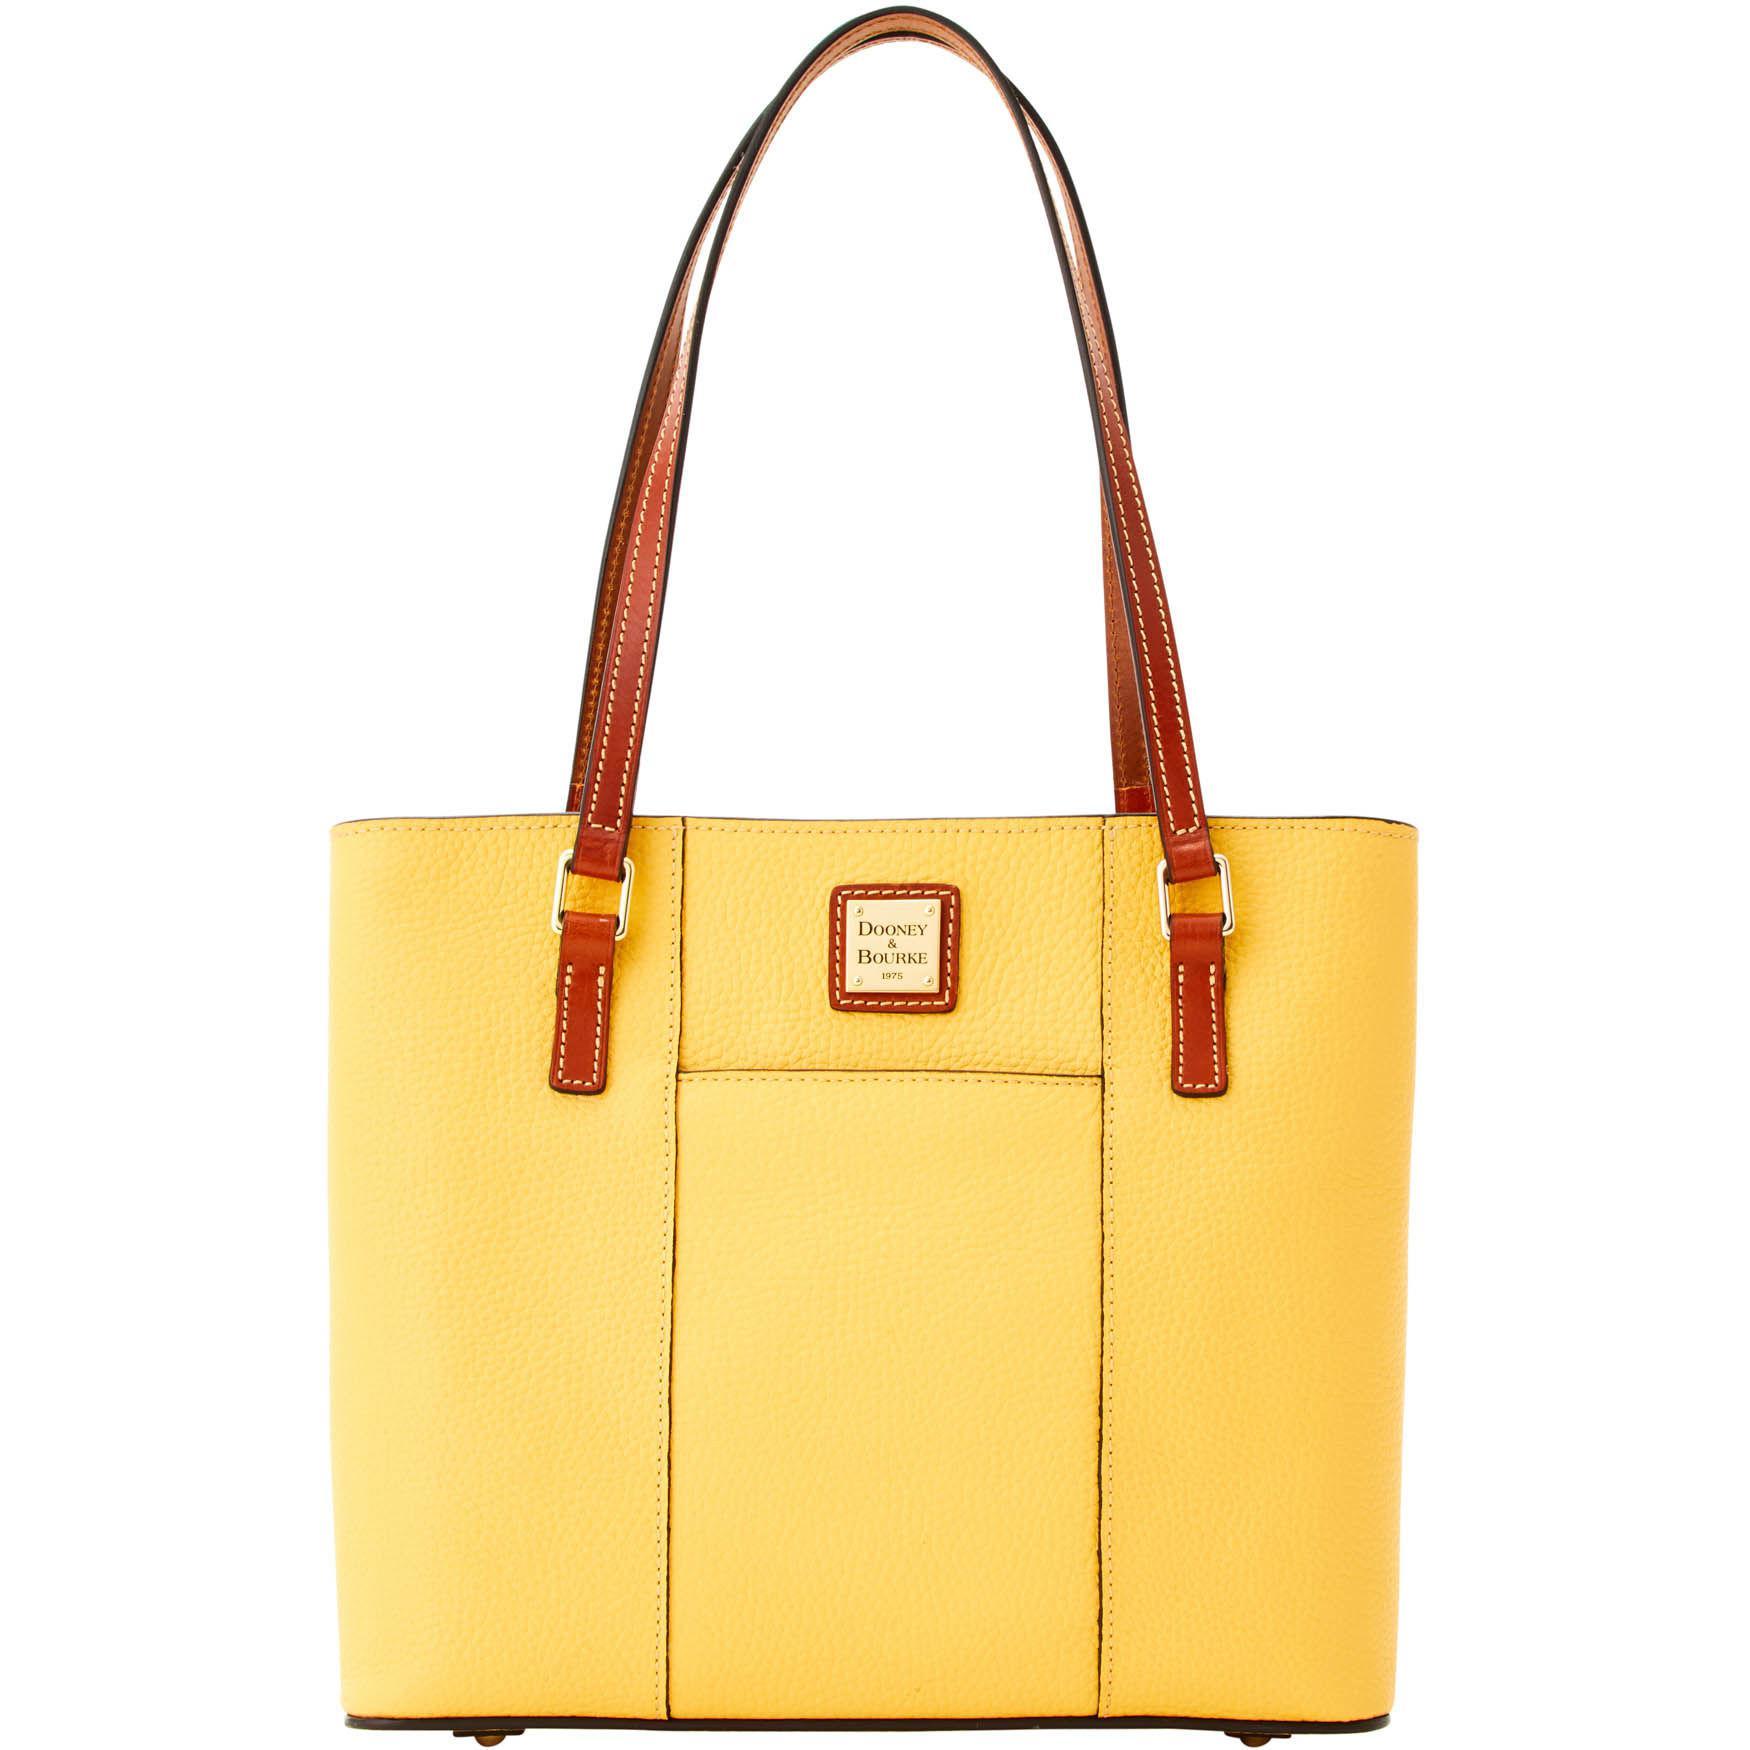 3d06fd4bab0a Dooney   Bourke. Women s Yellow Pebble Grain Small Lexington Shopper